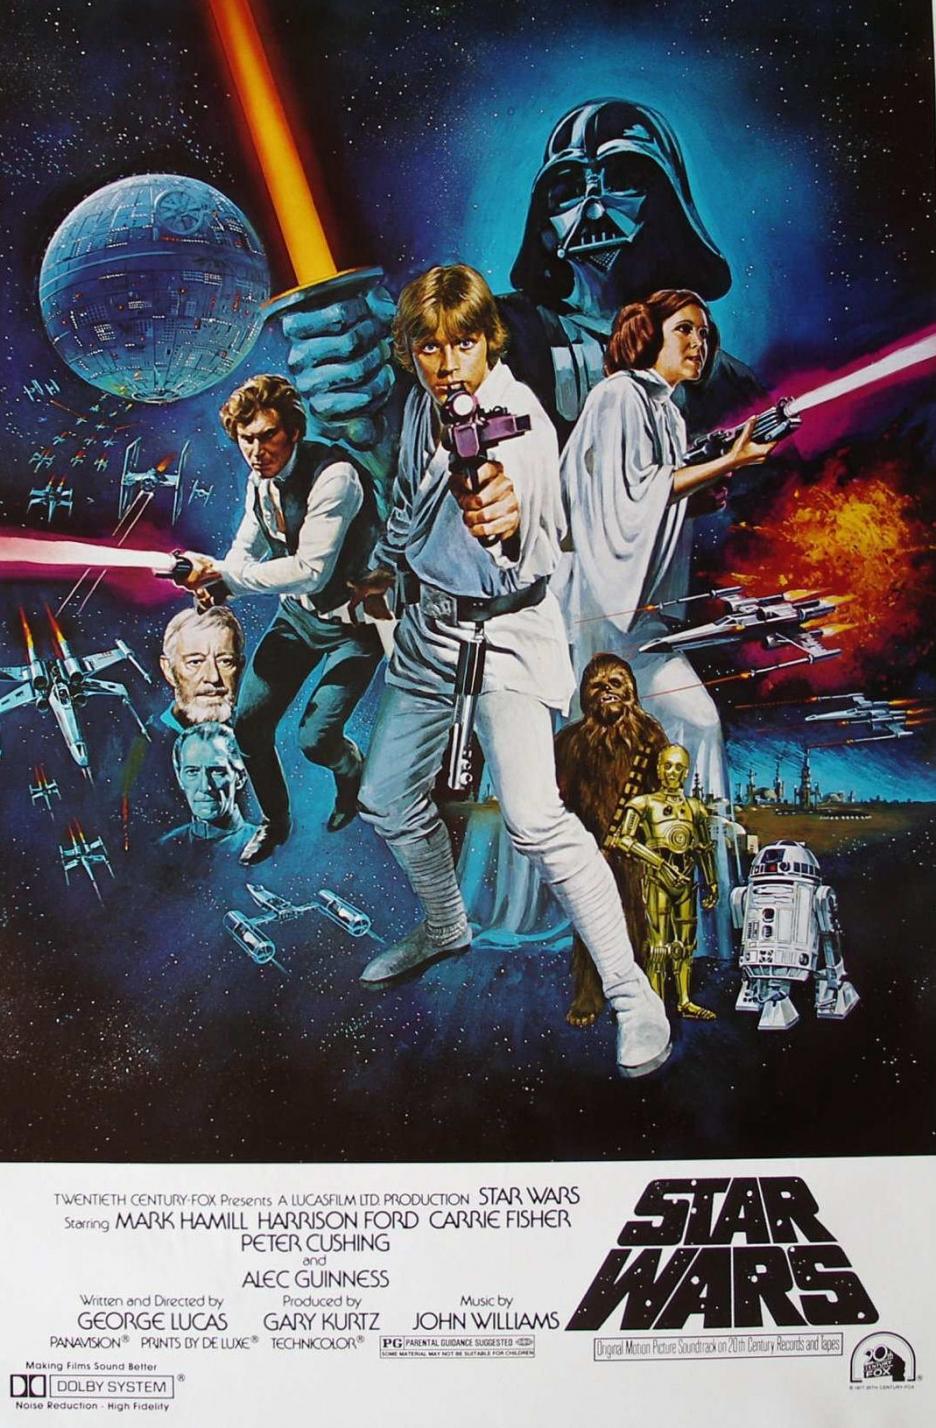 https://i1.wp.com/dailyorange.s3.amazonaws.com/wp-content/uploads/2015/07/star-wars-iv-a-new-hope-poster1.jpg